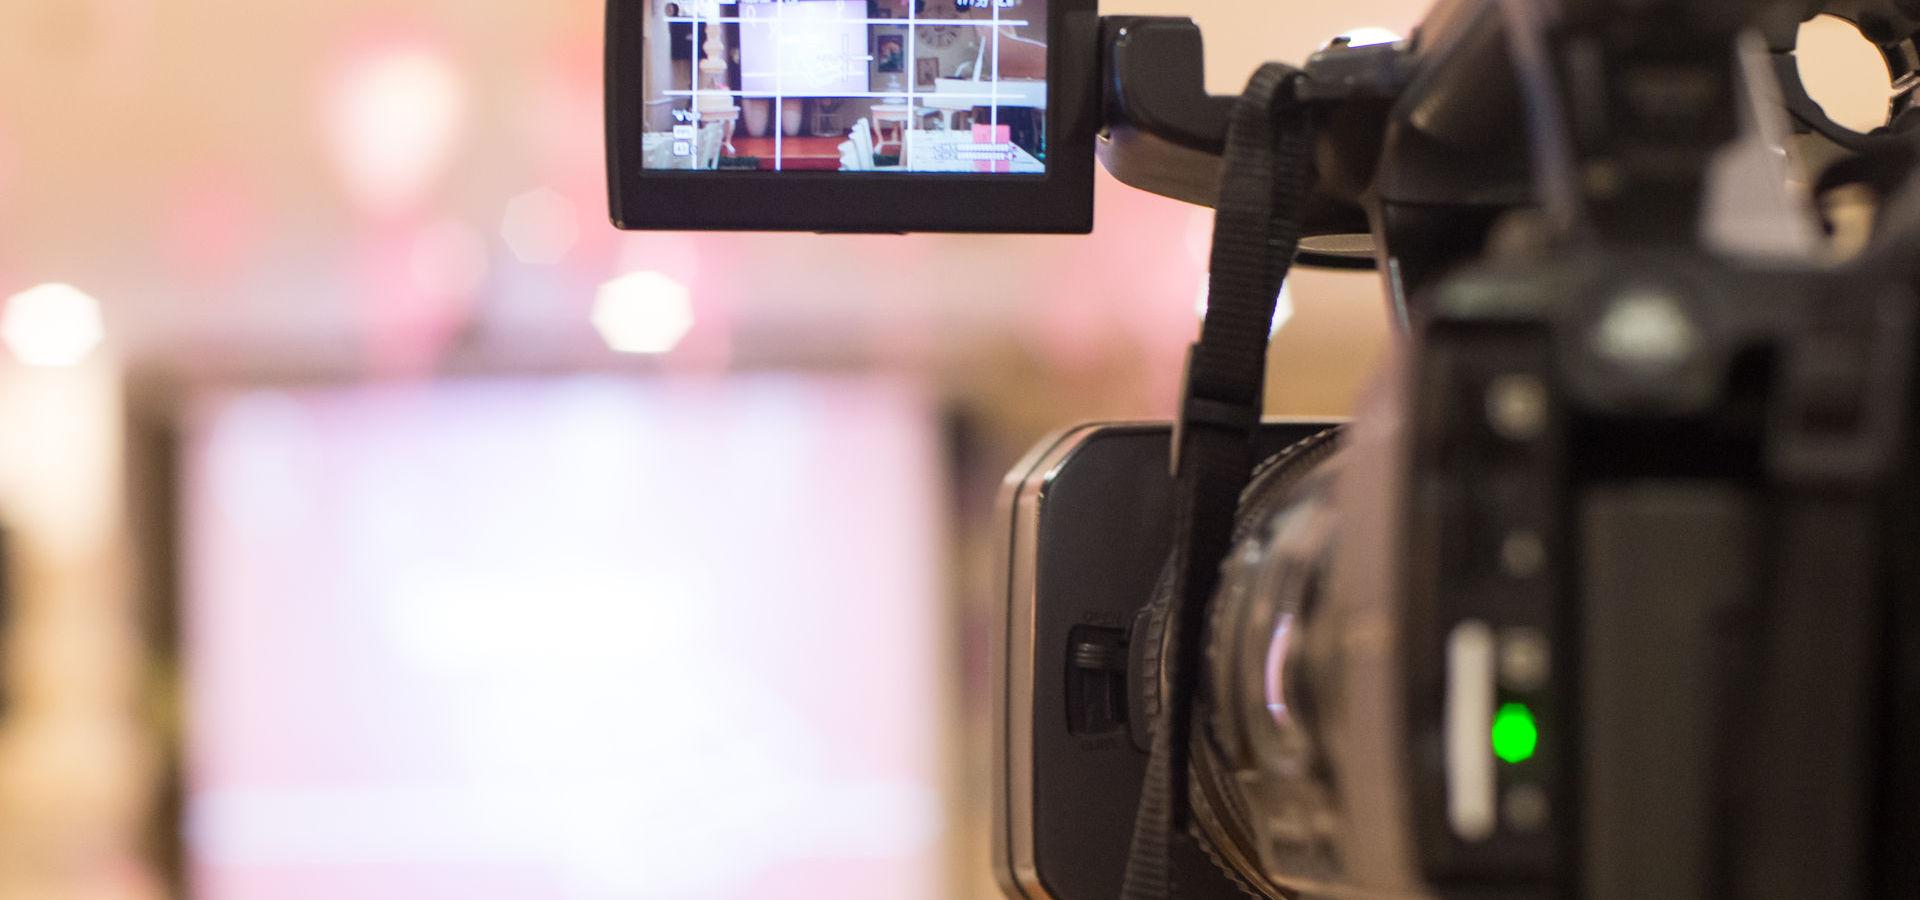 Making a Video Can Make a Big Impact